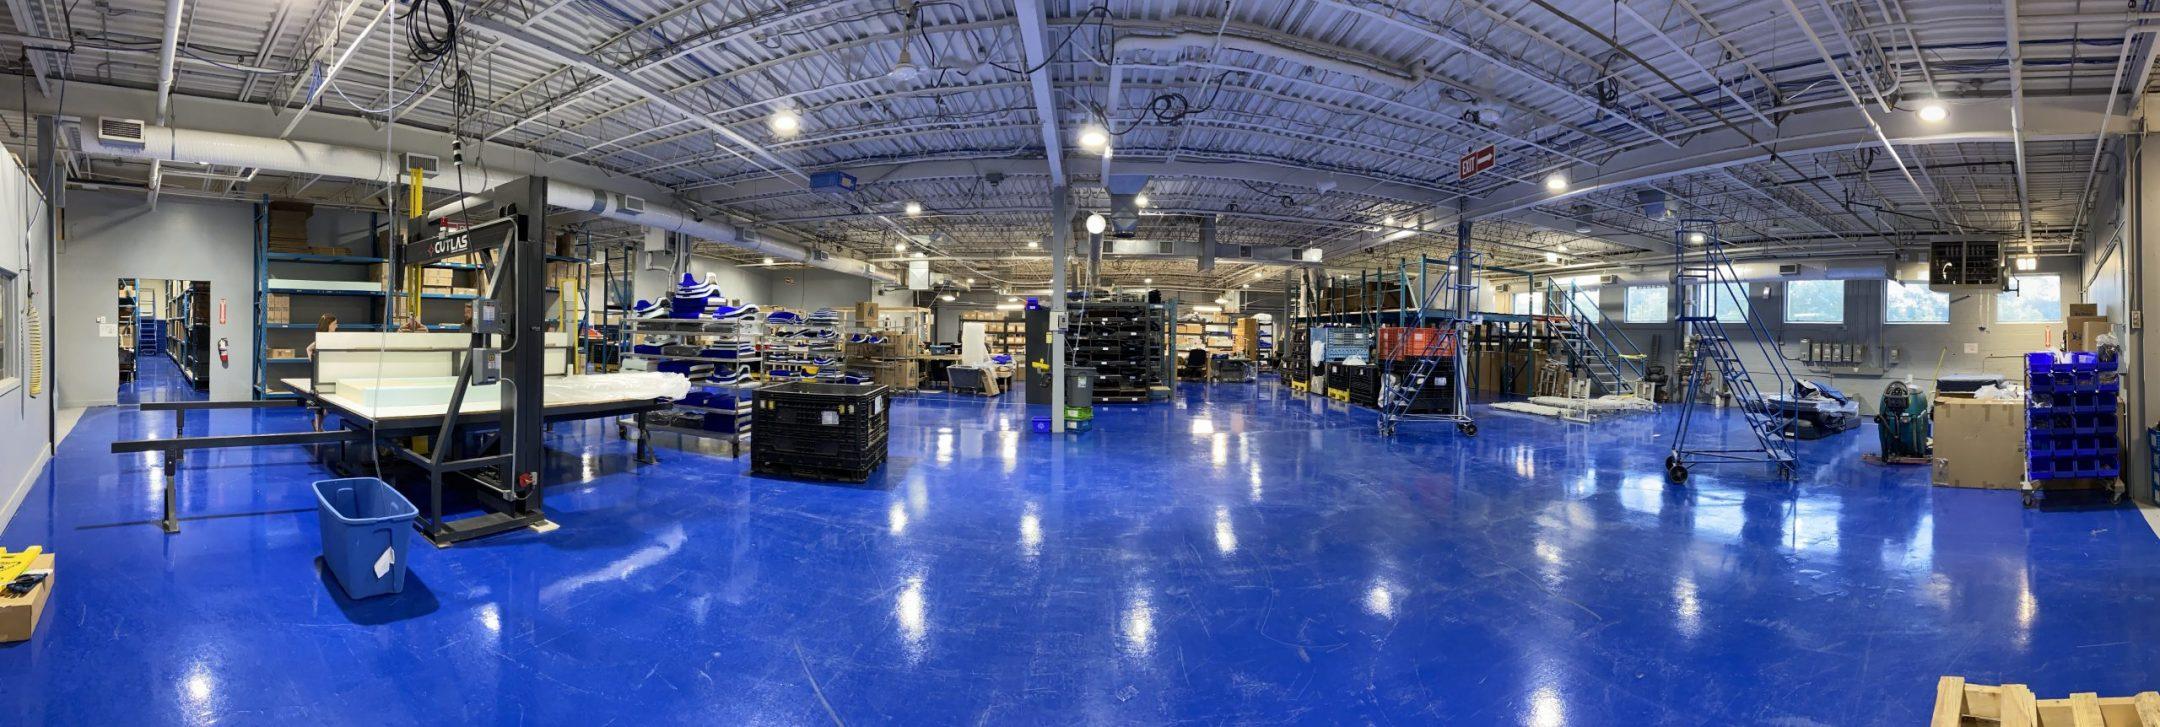 Blake Medical Production Area